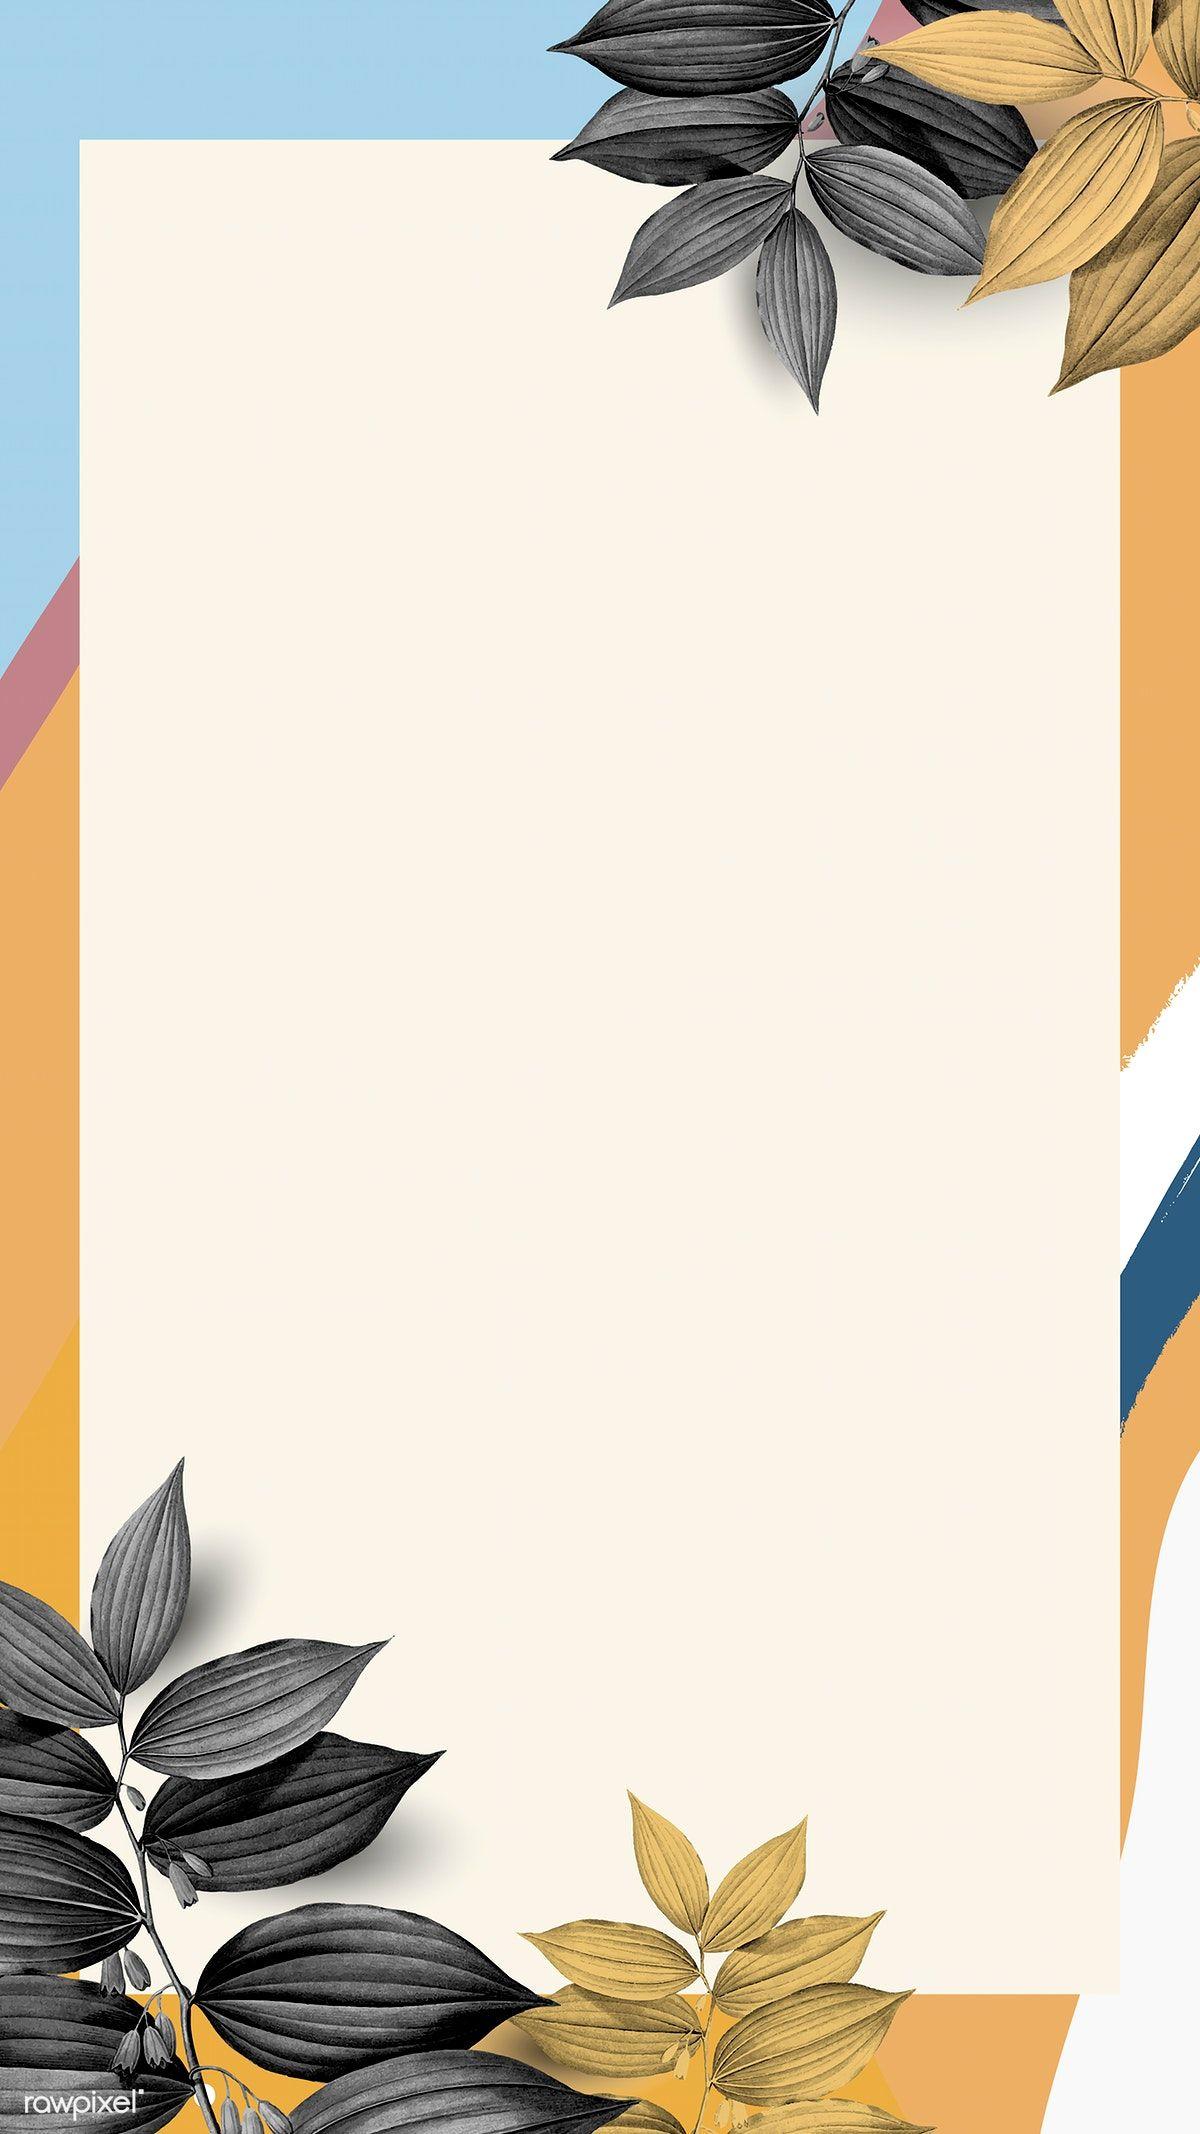 Rectangular Memphis Frame Design Vector Premium Image By Rawpixel Com Adj Poster Bunga Latar Belakang Seni